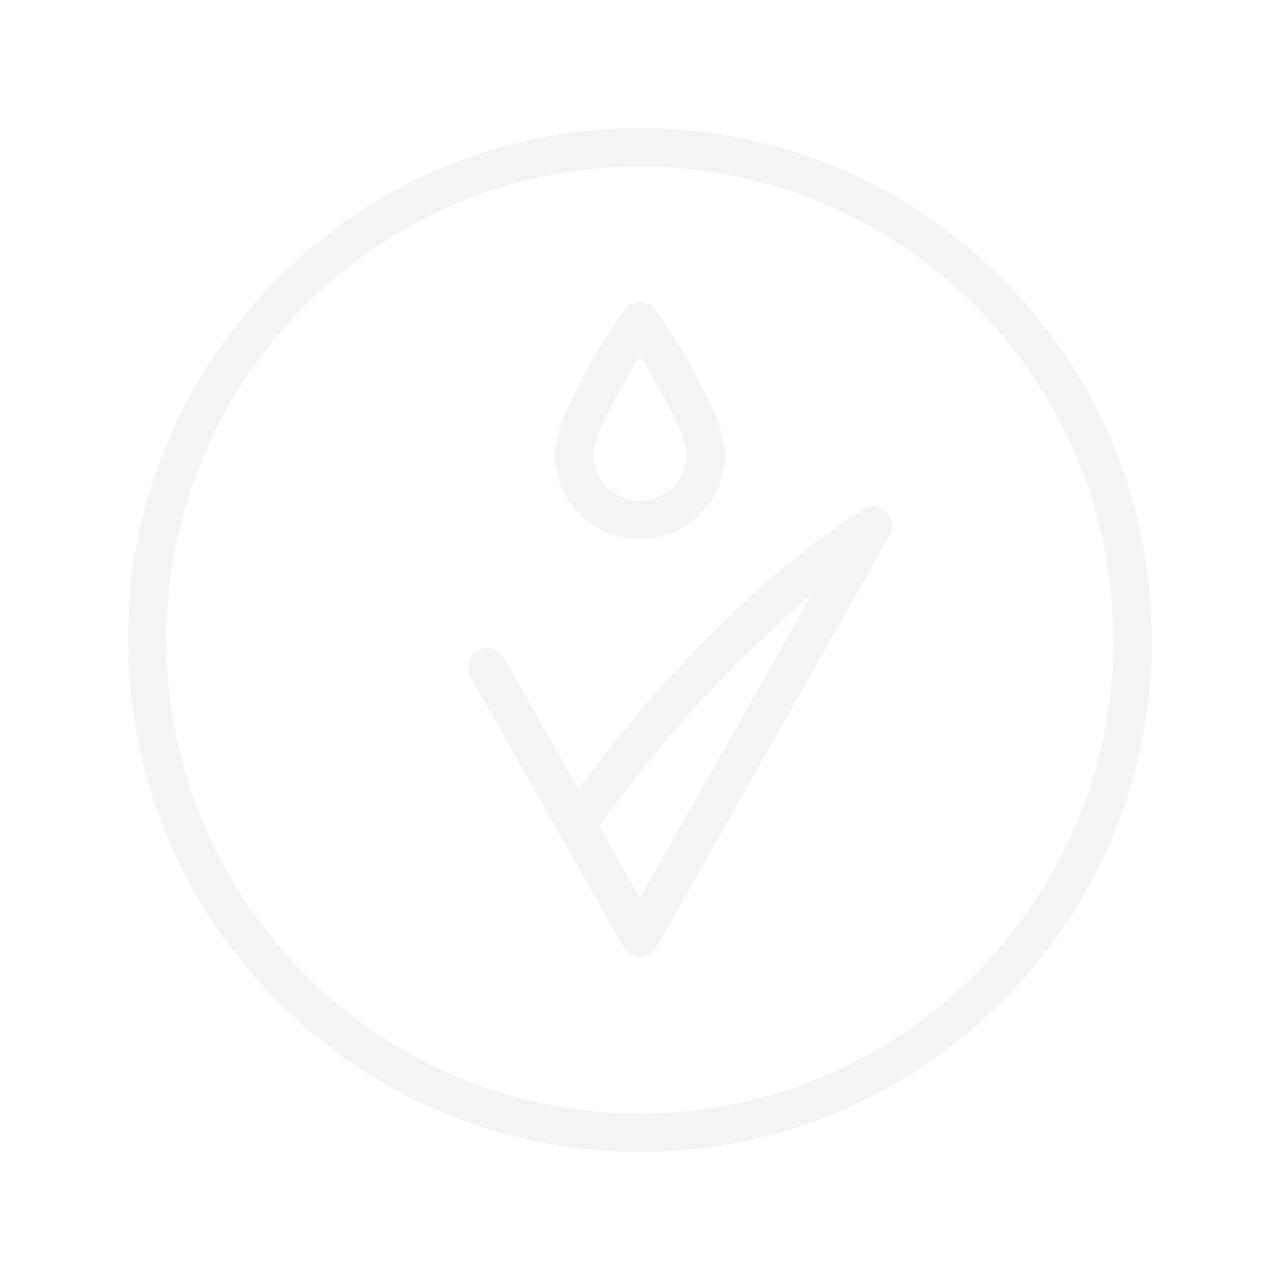 MAYBELLINE Affinitone Powder No.21 Nude 9g